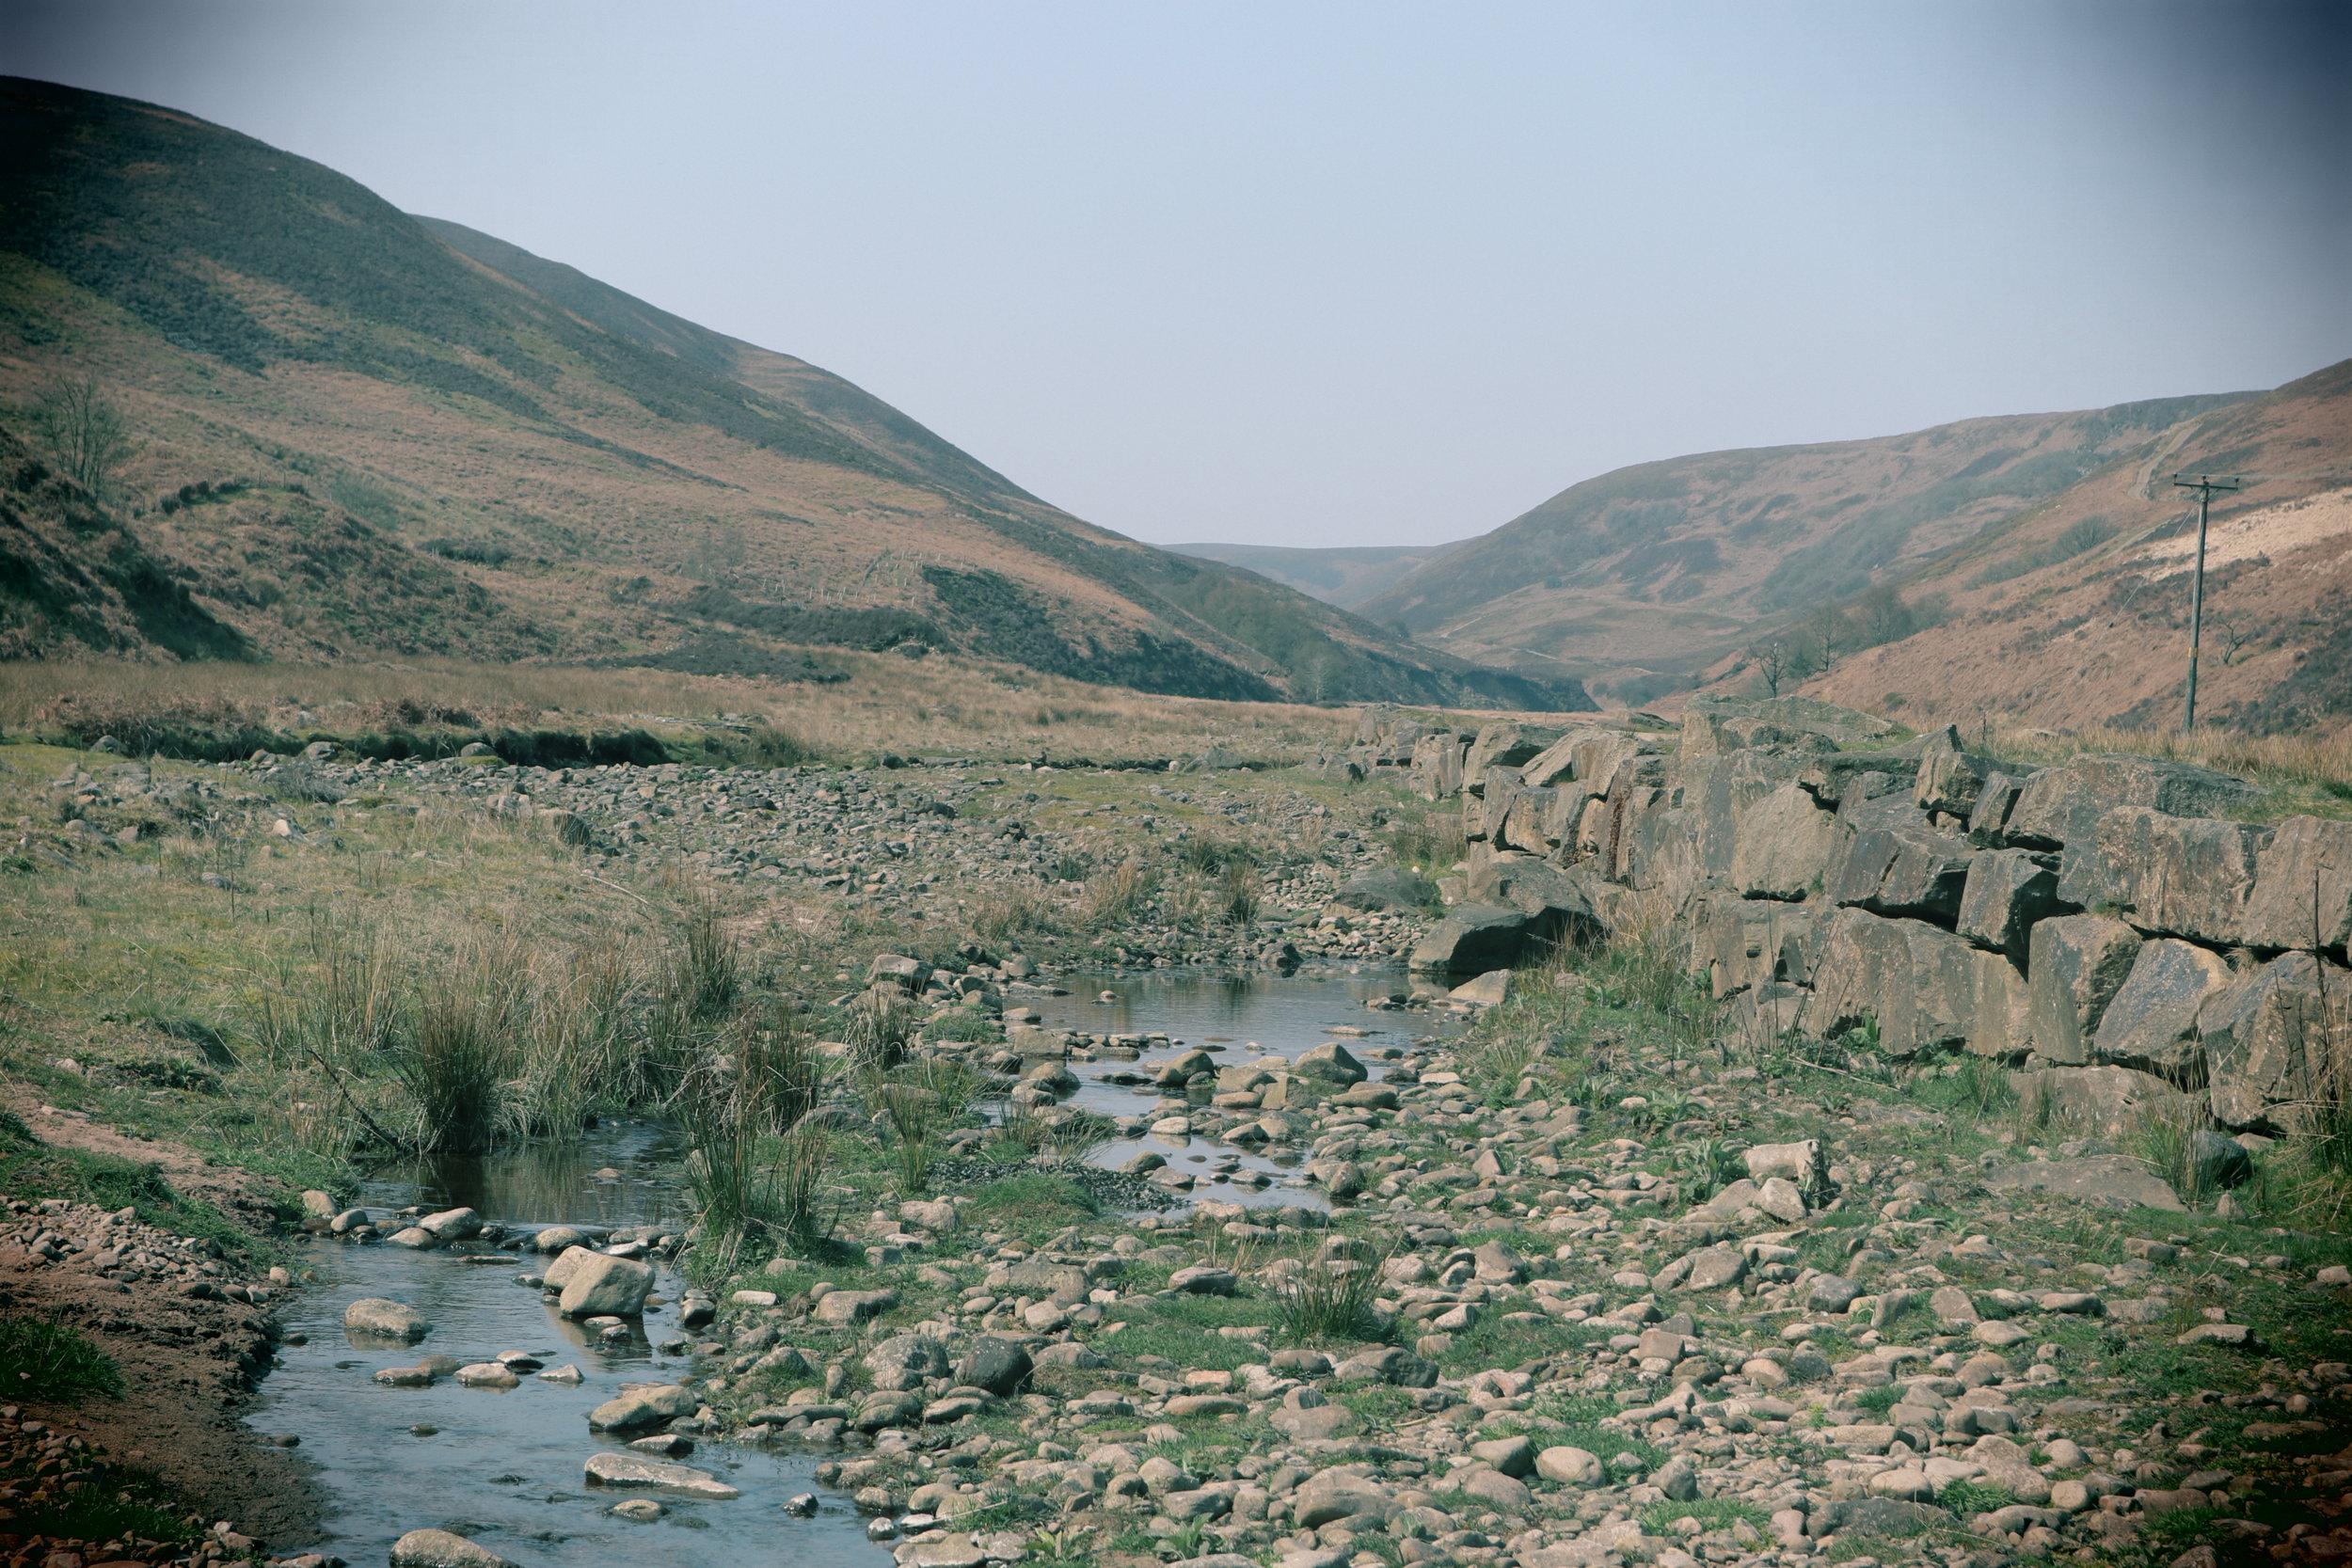 Locations - Where we campedHawthornthwaite FellWhere we parked